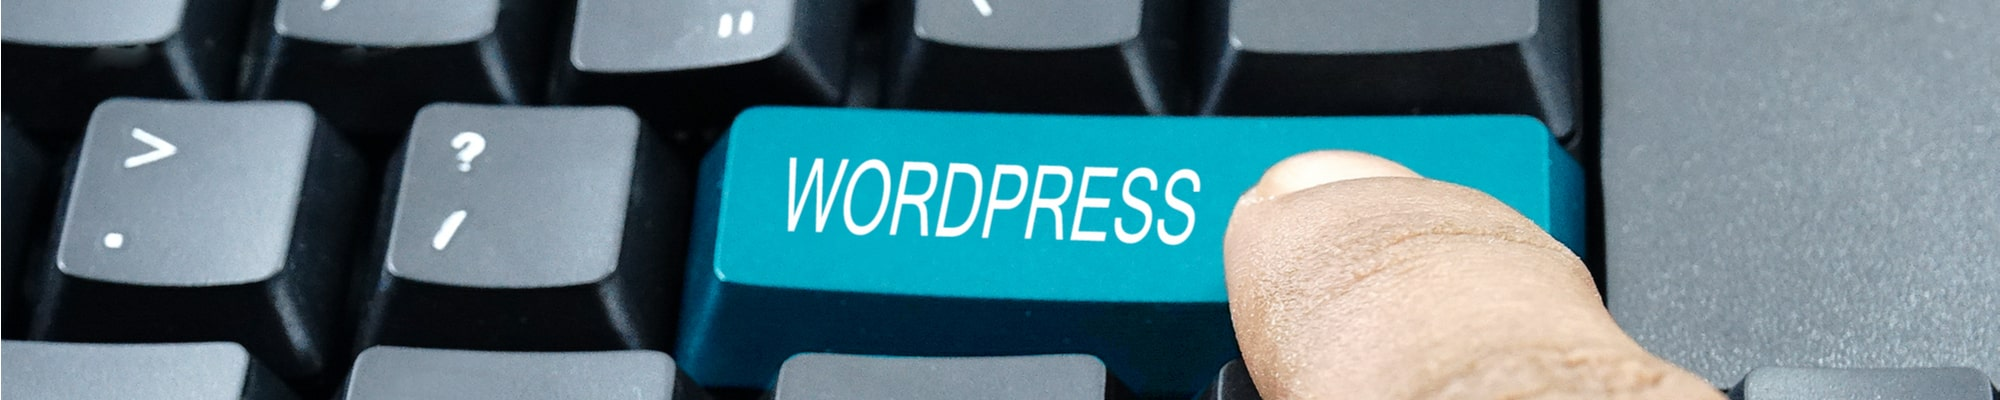 wordpress site building